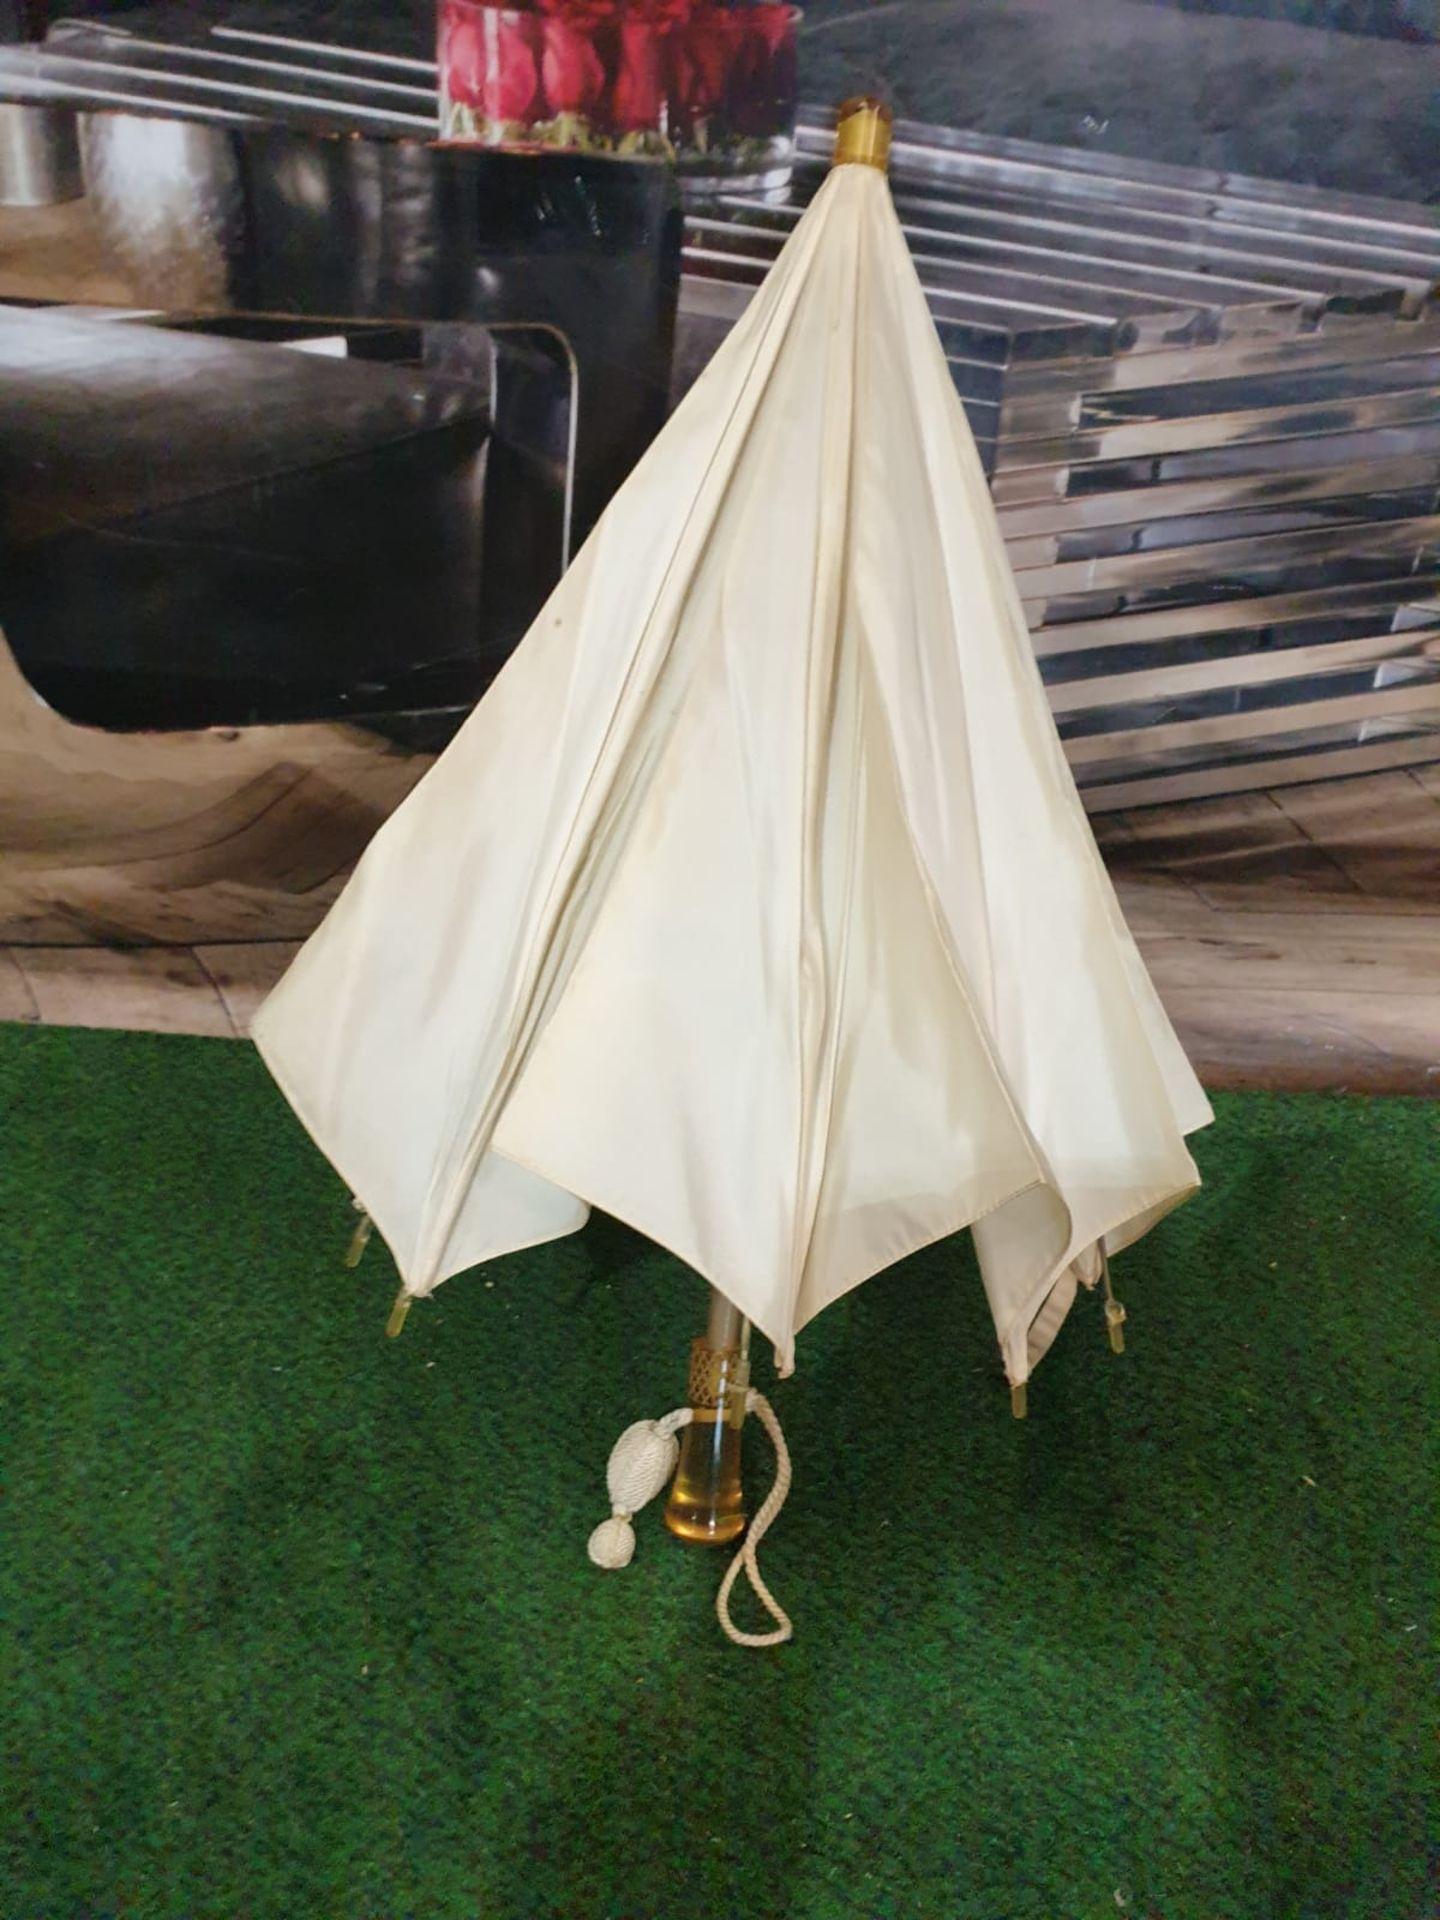 Ladies parasol Cream silk-like material - Yellow handle. Needs T.L.C.